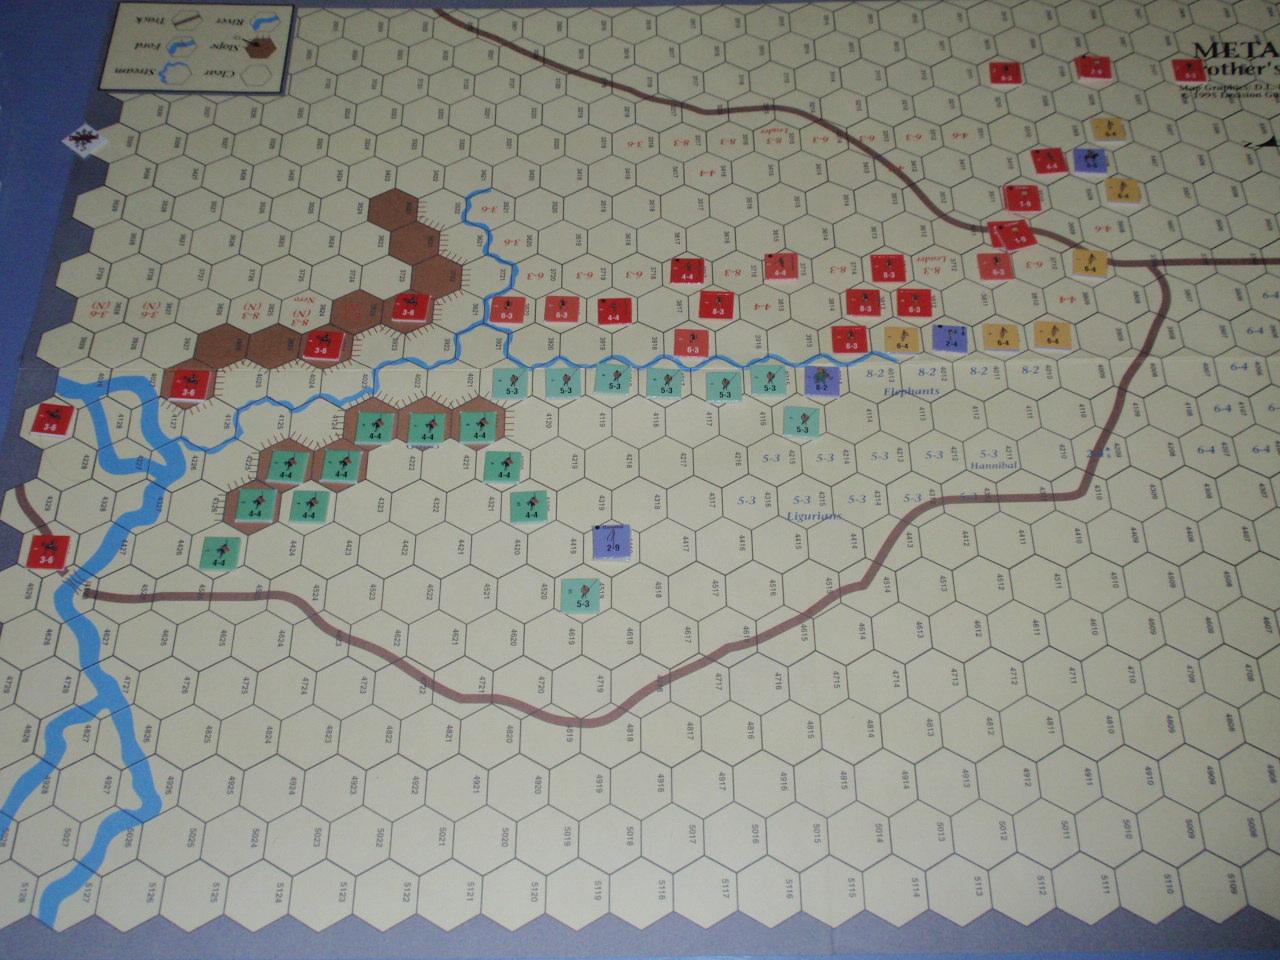 DG「Battles of the Ancient World」シリーズから「Metauras 207B.C.」をソロプレイ③_b0162202_1942337.jpg